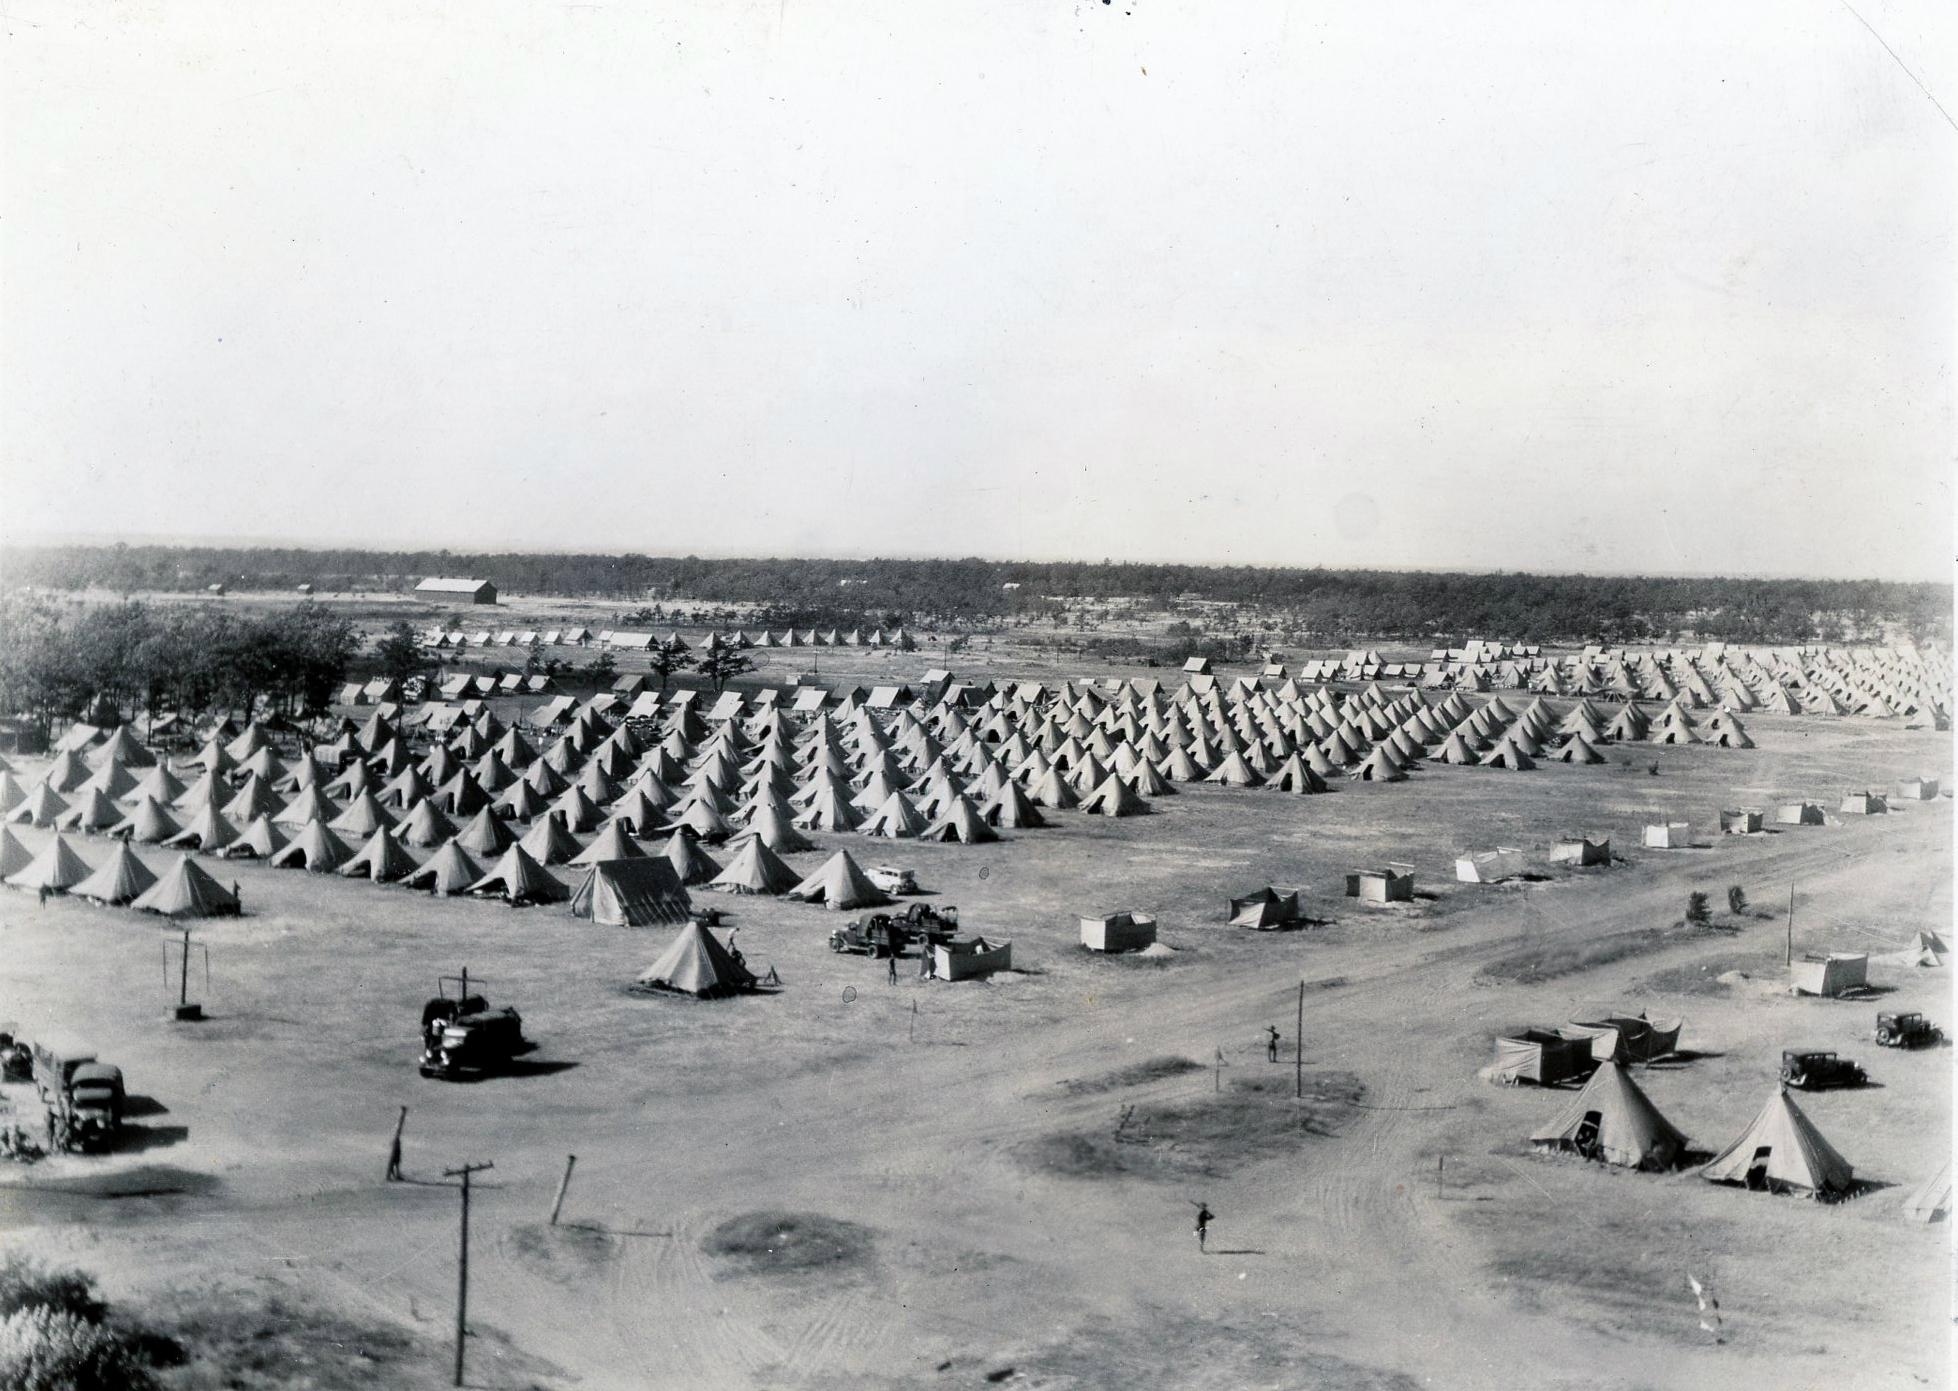 Aerial view of Pine Camp in Fort Drum region |